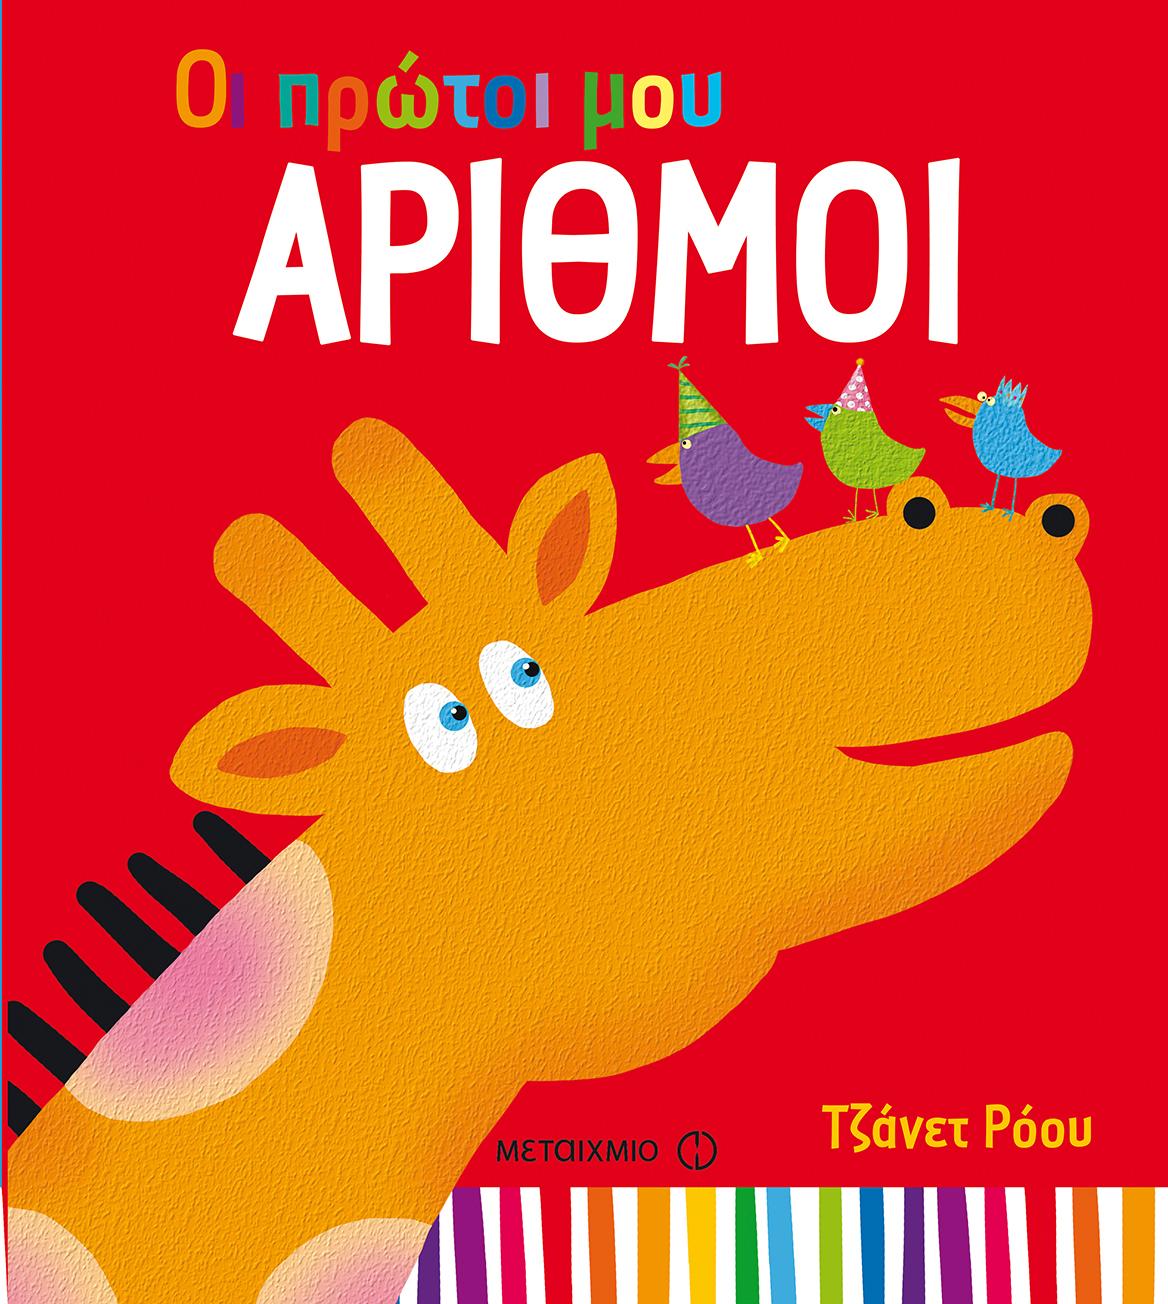 80fff57dfd8 Για παιδιά από ενός έτους, οι εκδόσεις Μεταίχμιο προτείνουν τα βιβλία «Οι  πρώτες μου γνώσεις» και «Οι πρώτοι μου αριθμοί», της Τζάνετ Ρόου, που  βοηθούν τους ...